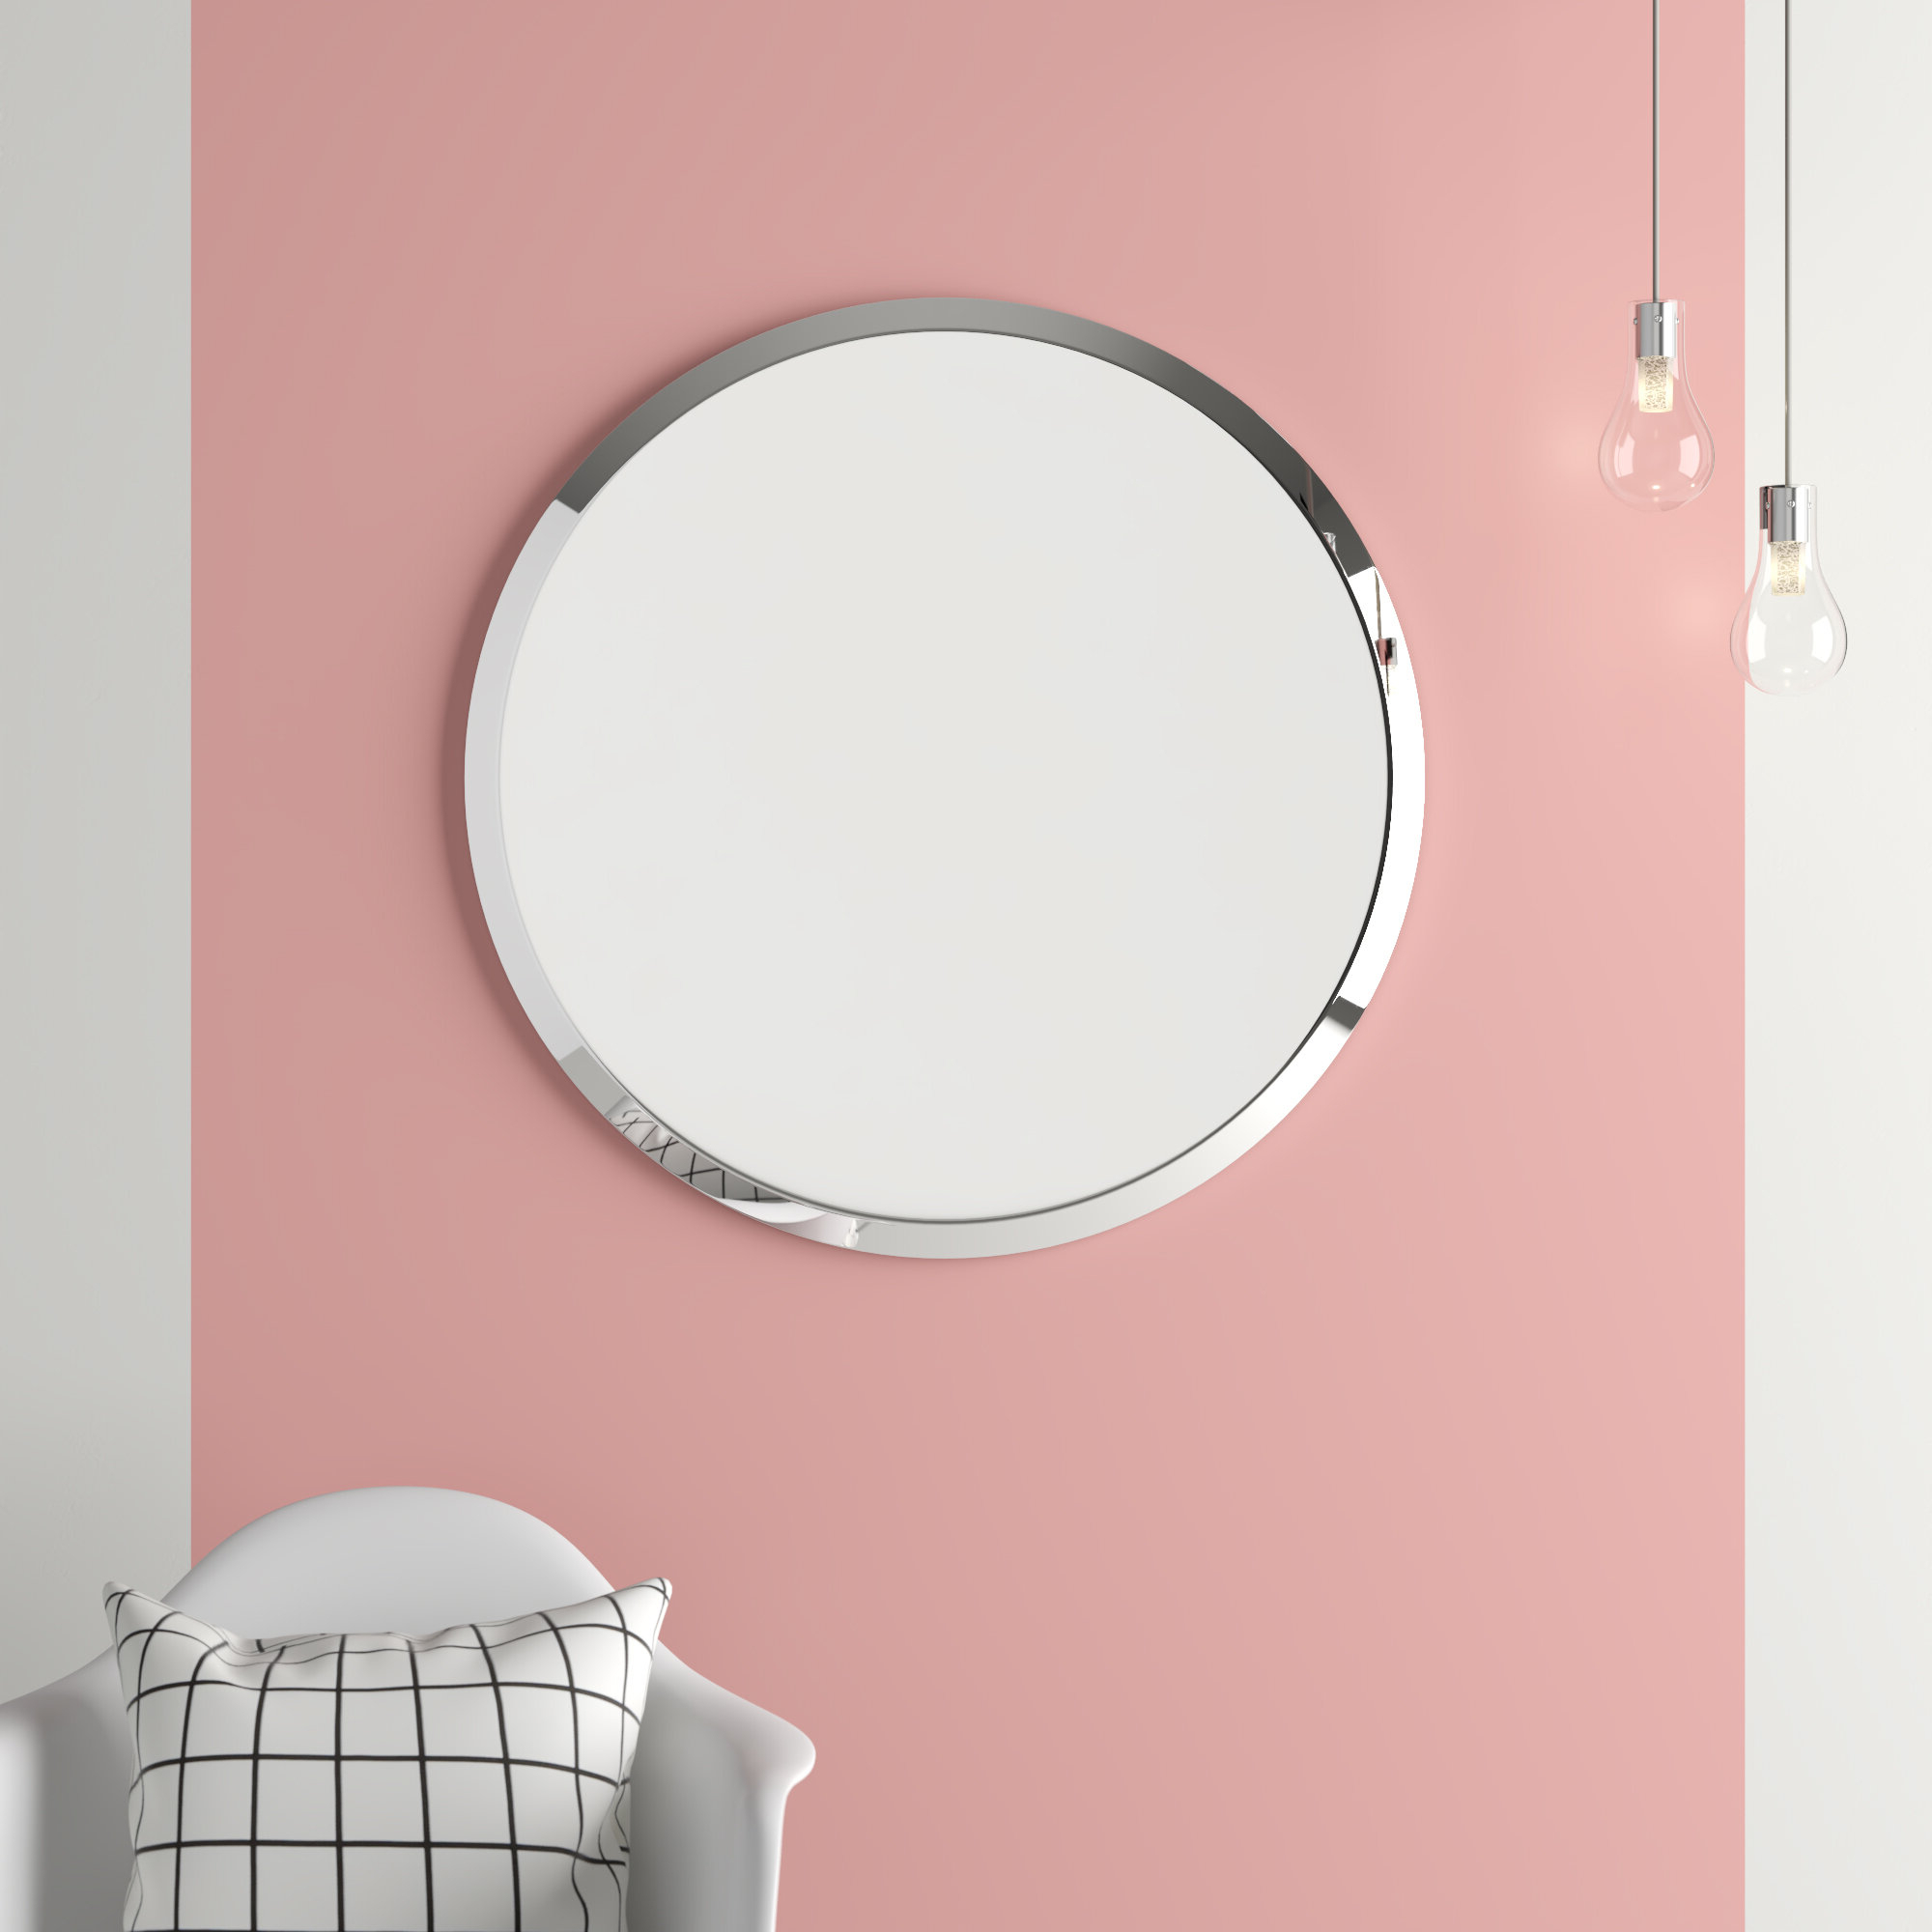 Well Liked Celeste Frameless Round Wall Mirrors Regarding Celeste Frameless Round Wall Mirror (View 1 of 20)